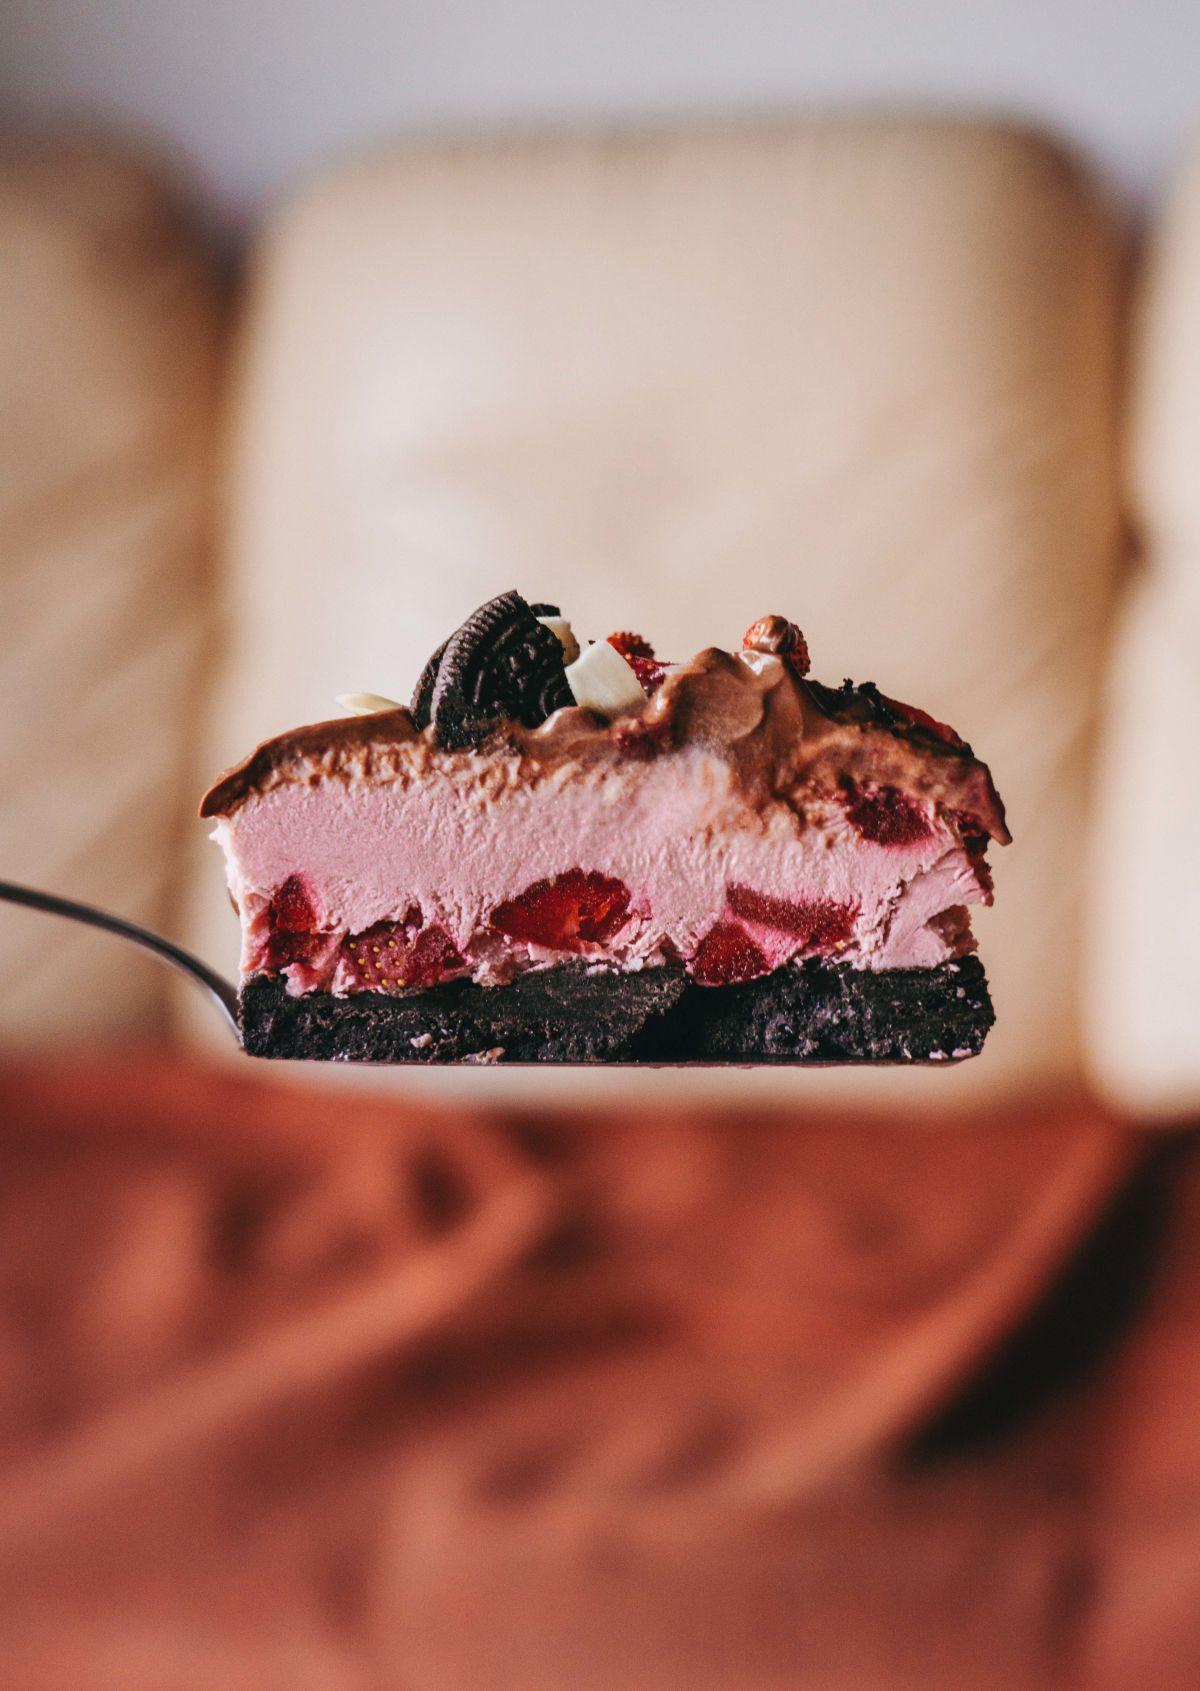 Slastna veganska jagodno-oreo sladoledna torta.